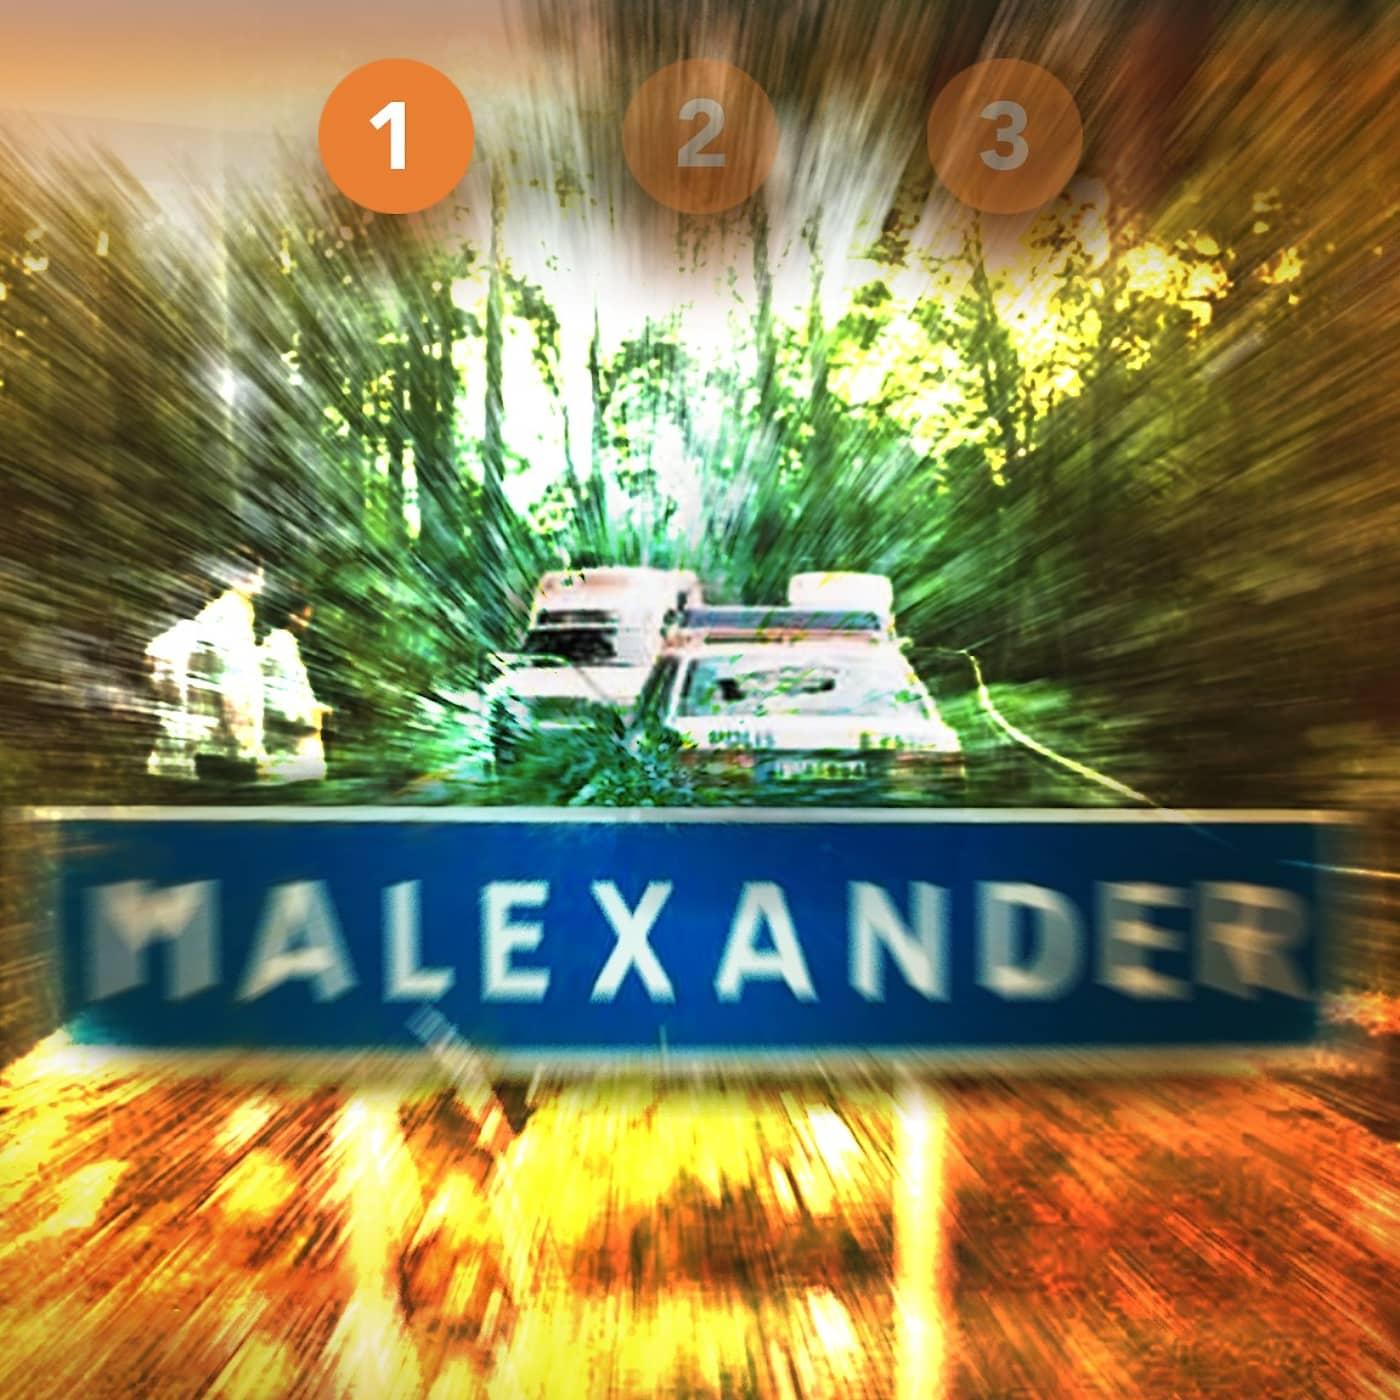 PODDTIPS: Malexander - Min pappa var odödlig